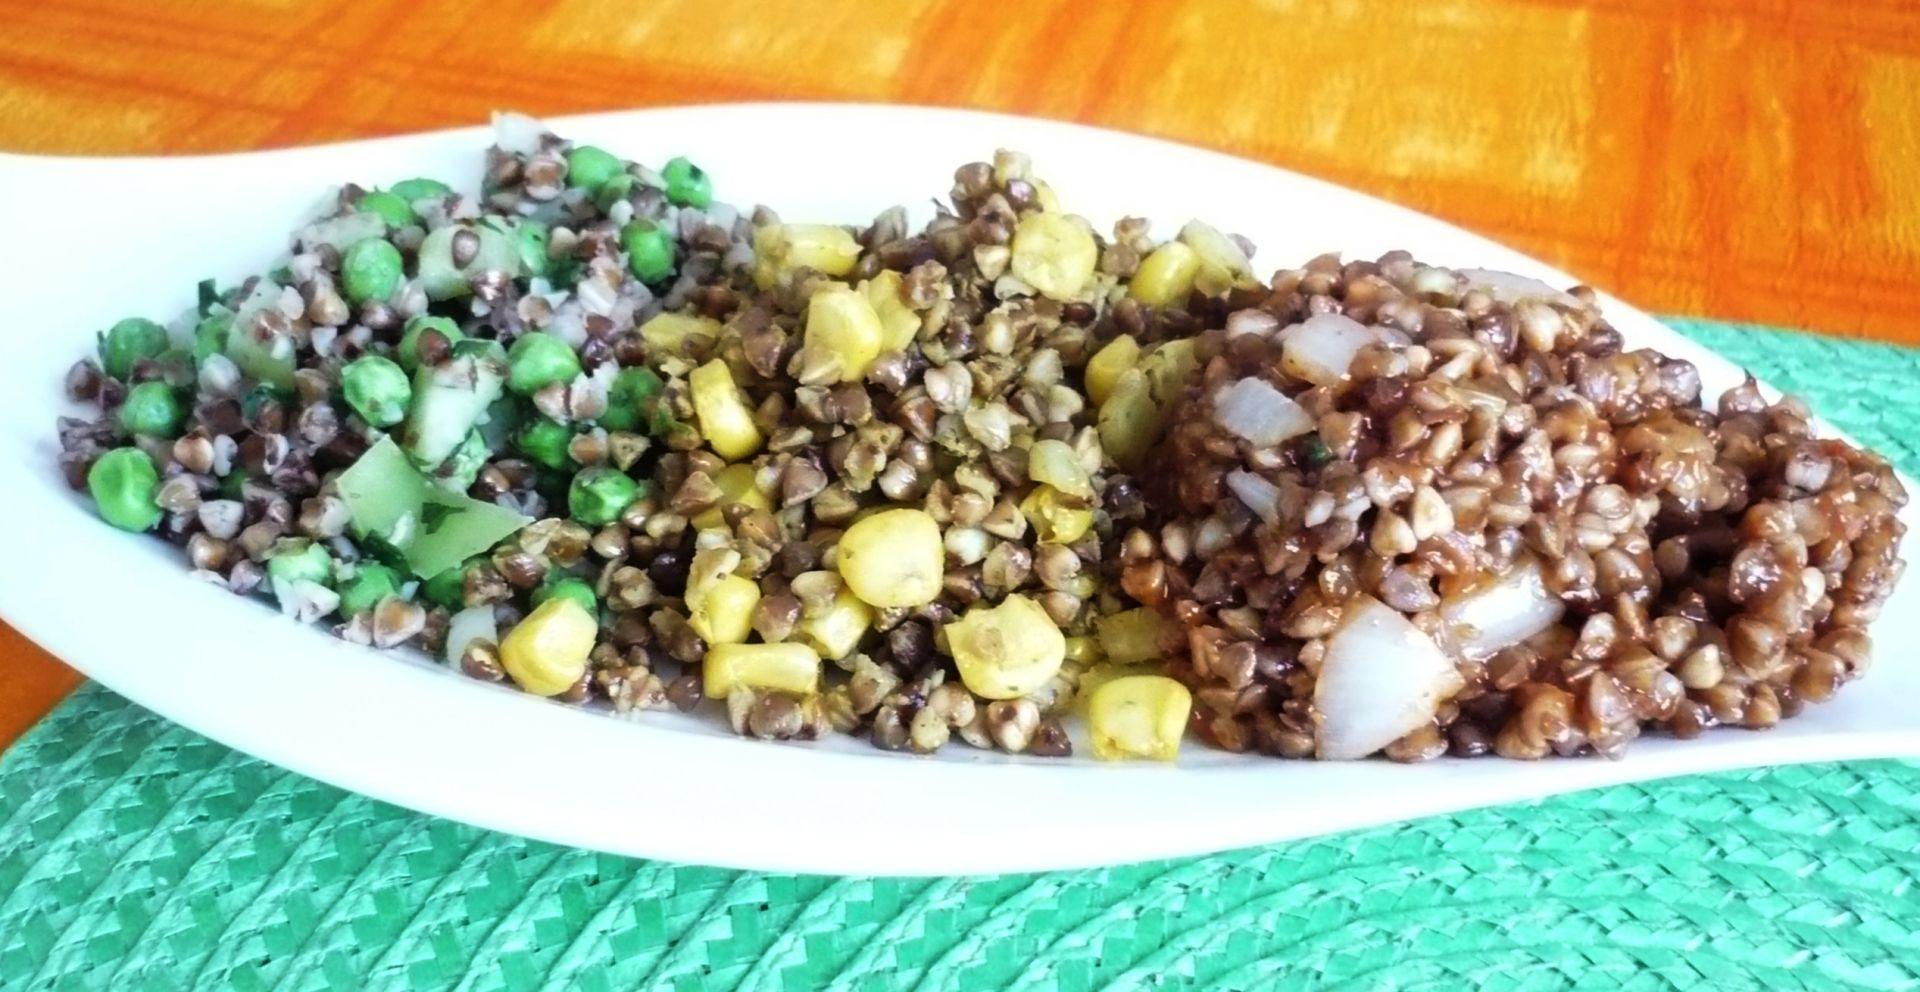 Tříbarevná pohanka recept